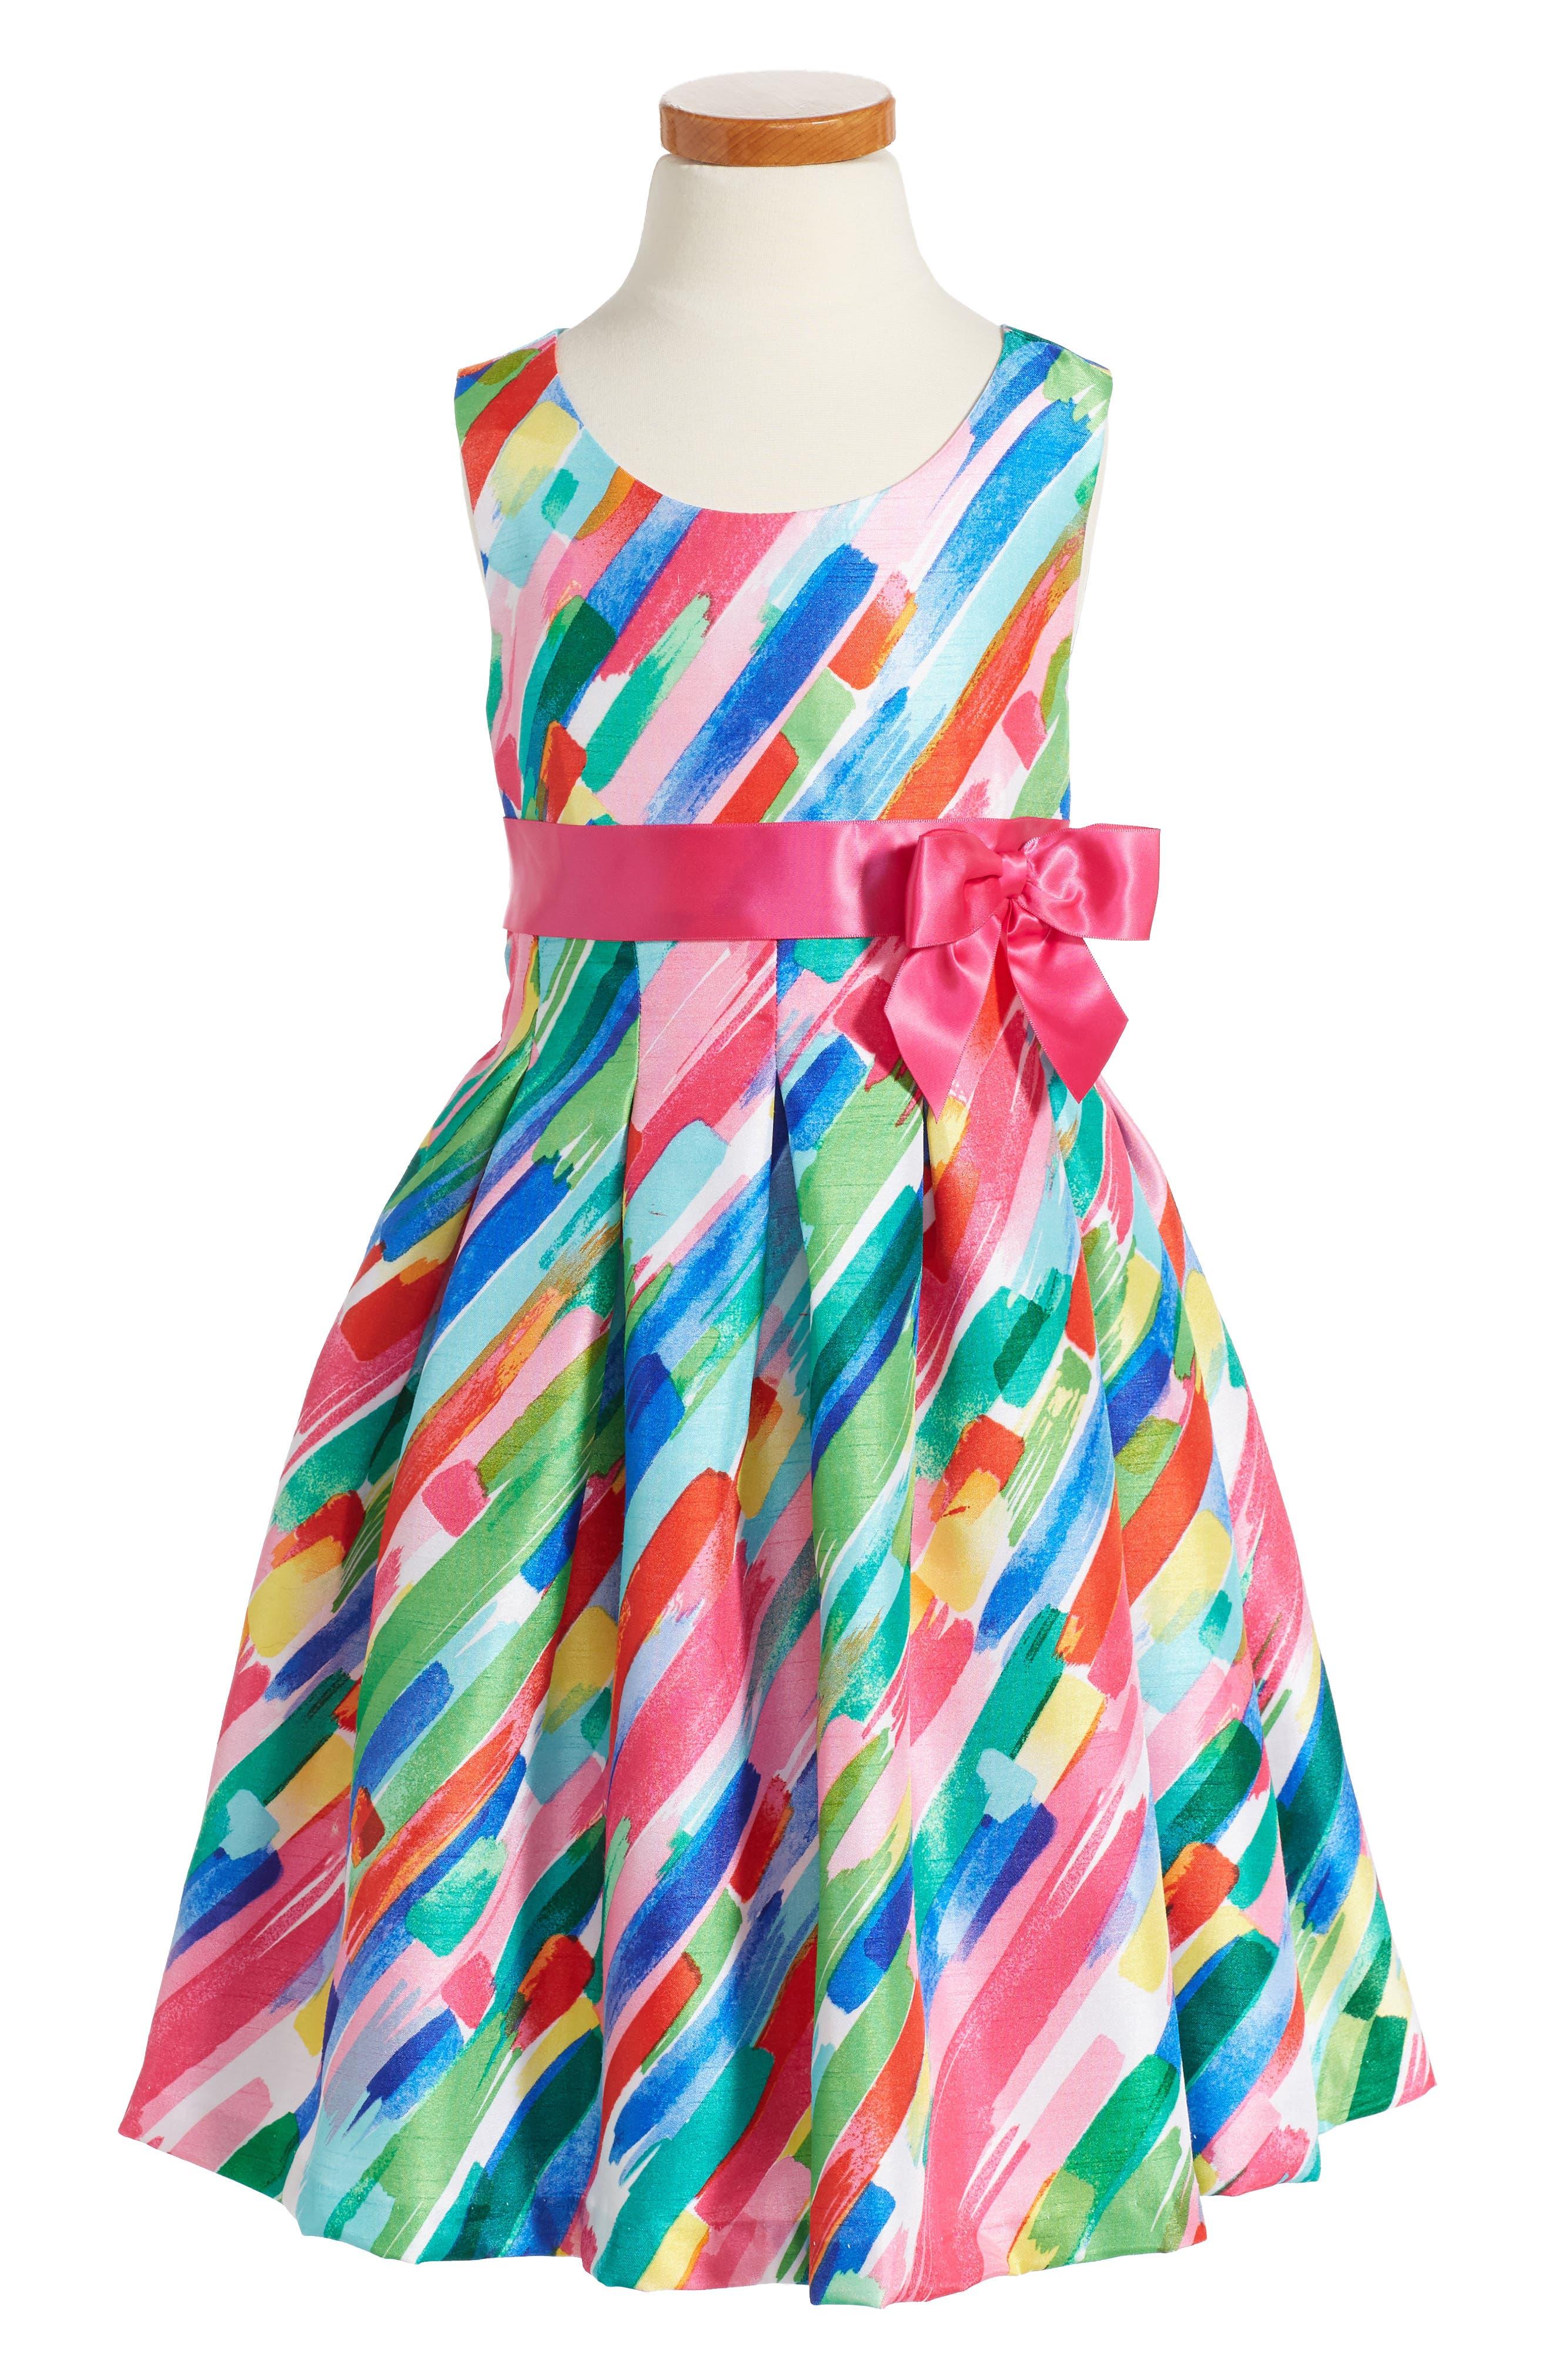 Paintstroke Print Shantung Party Dress,                             Main thumbnail 1, color,                             670